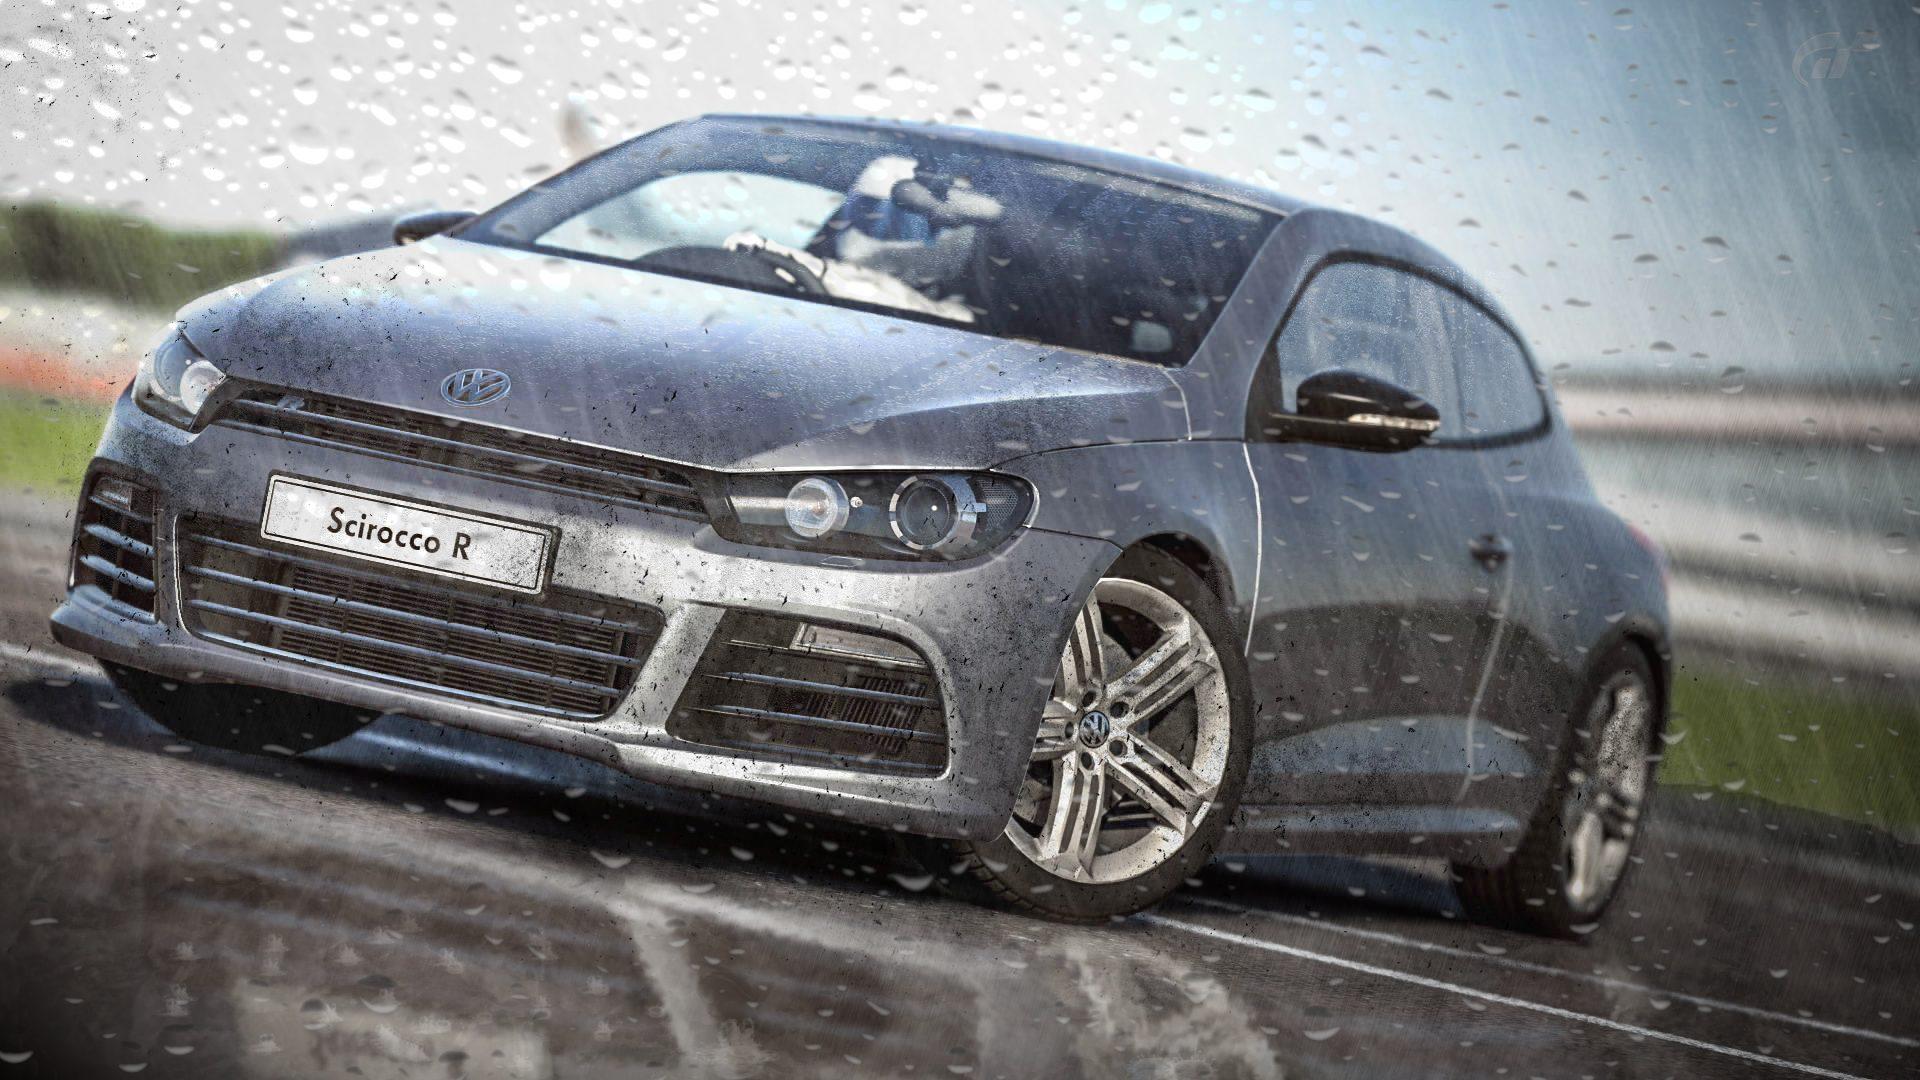 Sirocco_Silverstone_1_Rain.jpg